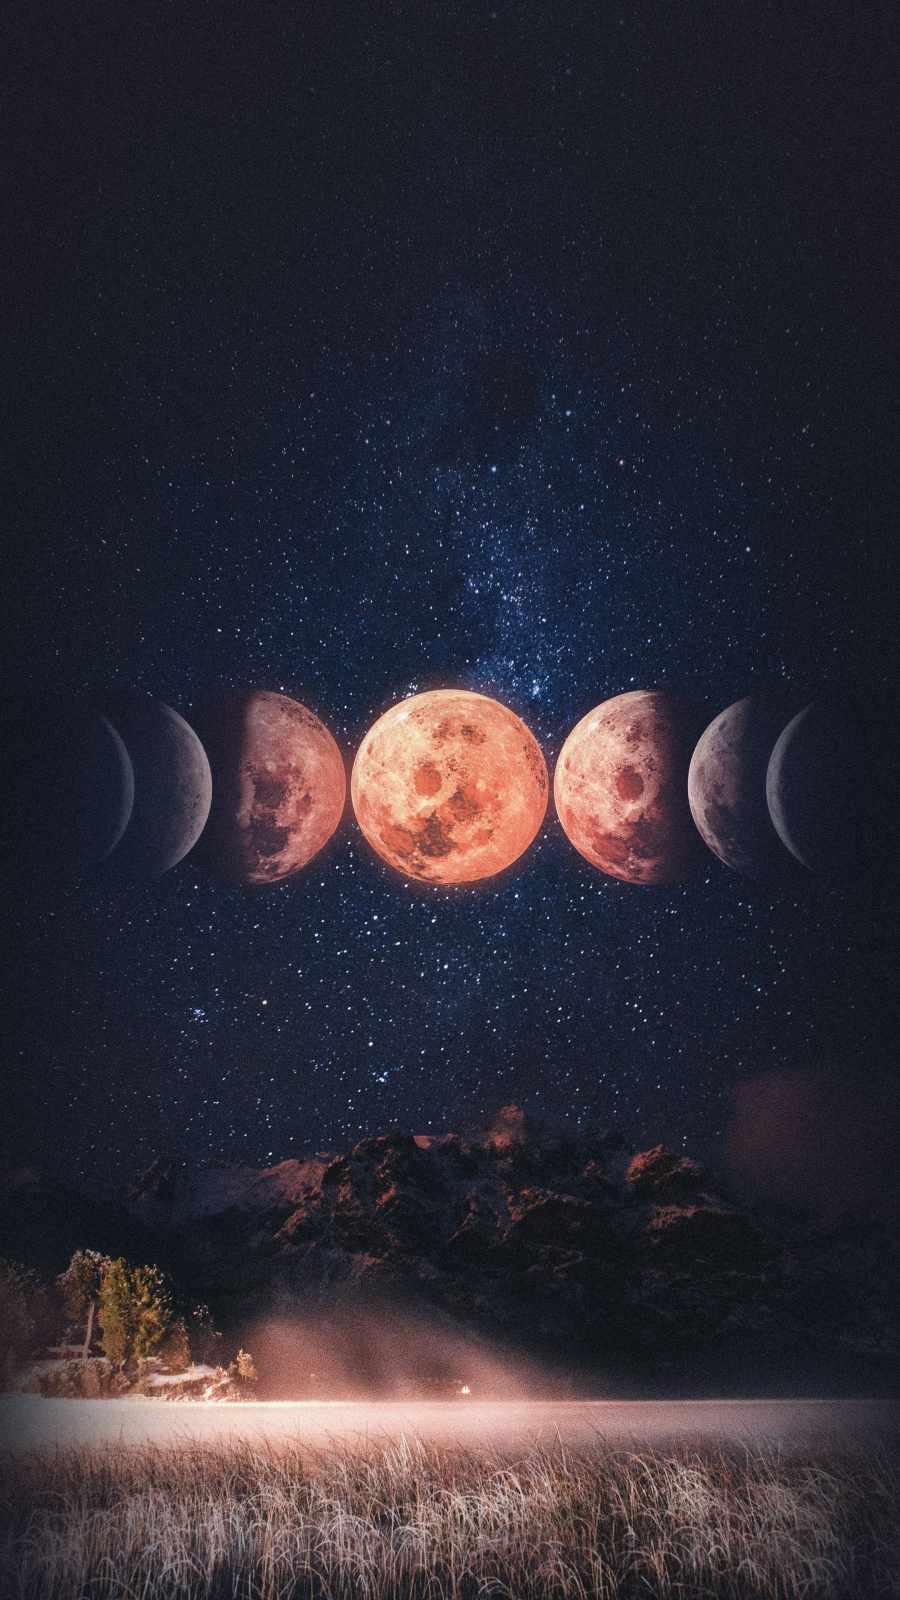 Iphone wallpaper moon – Artofit